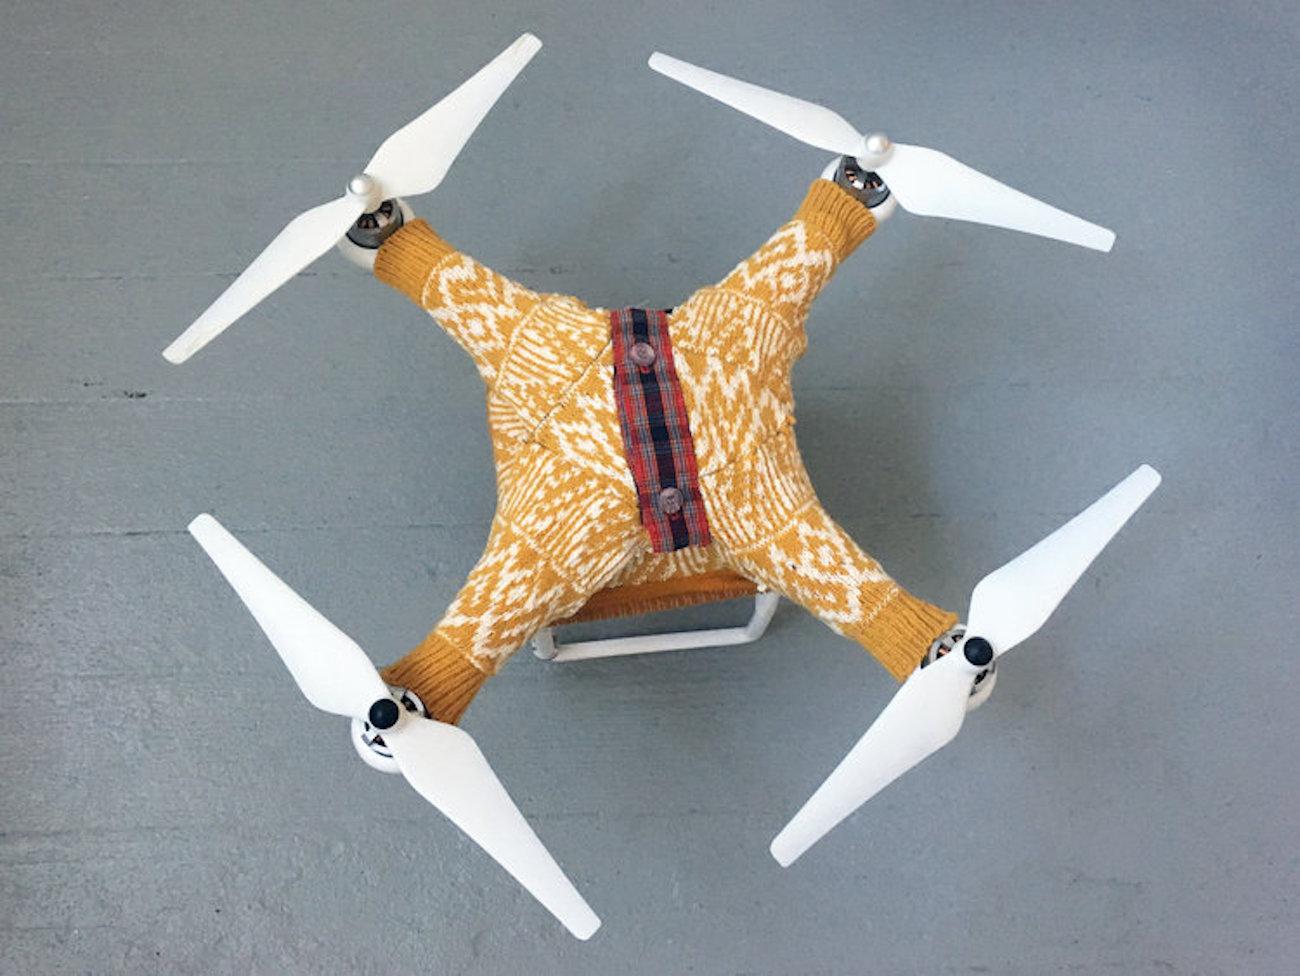 Custom+Drone+Sweaters